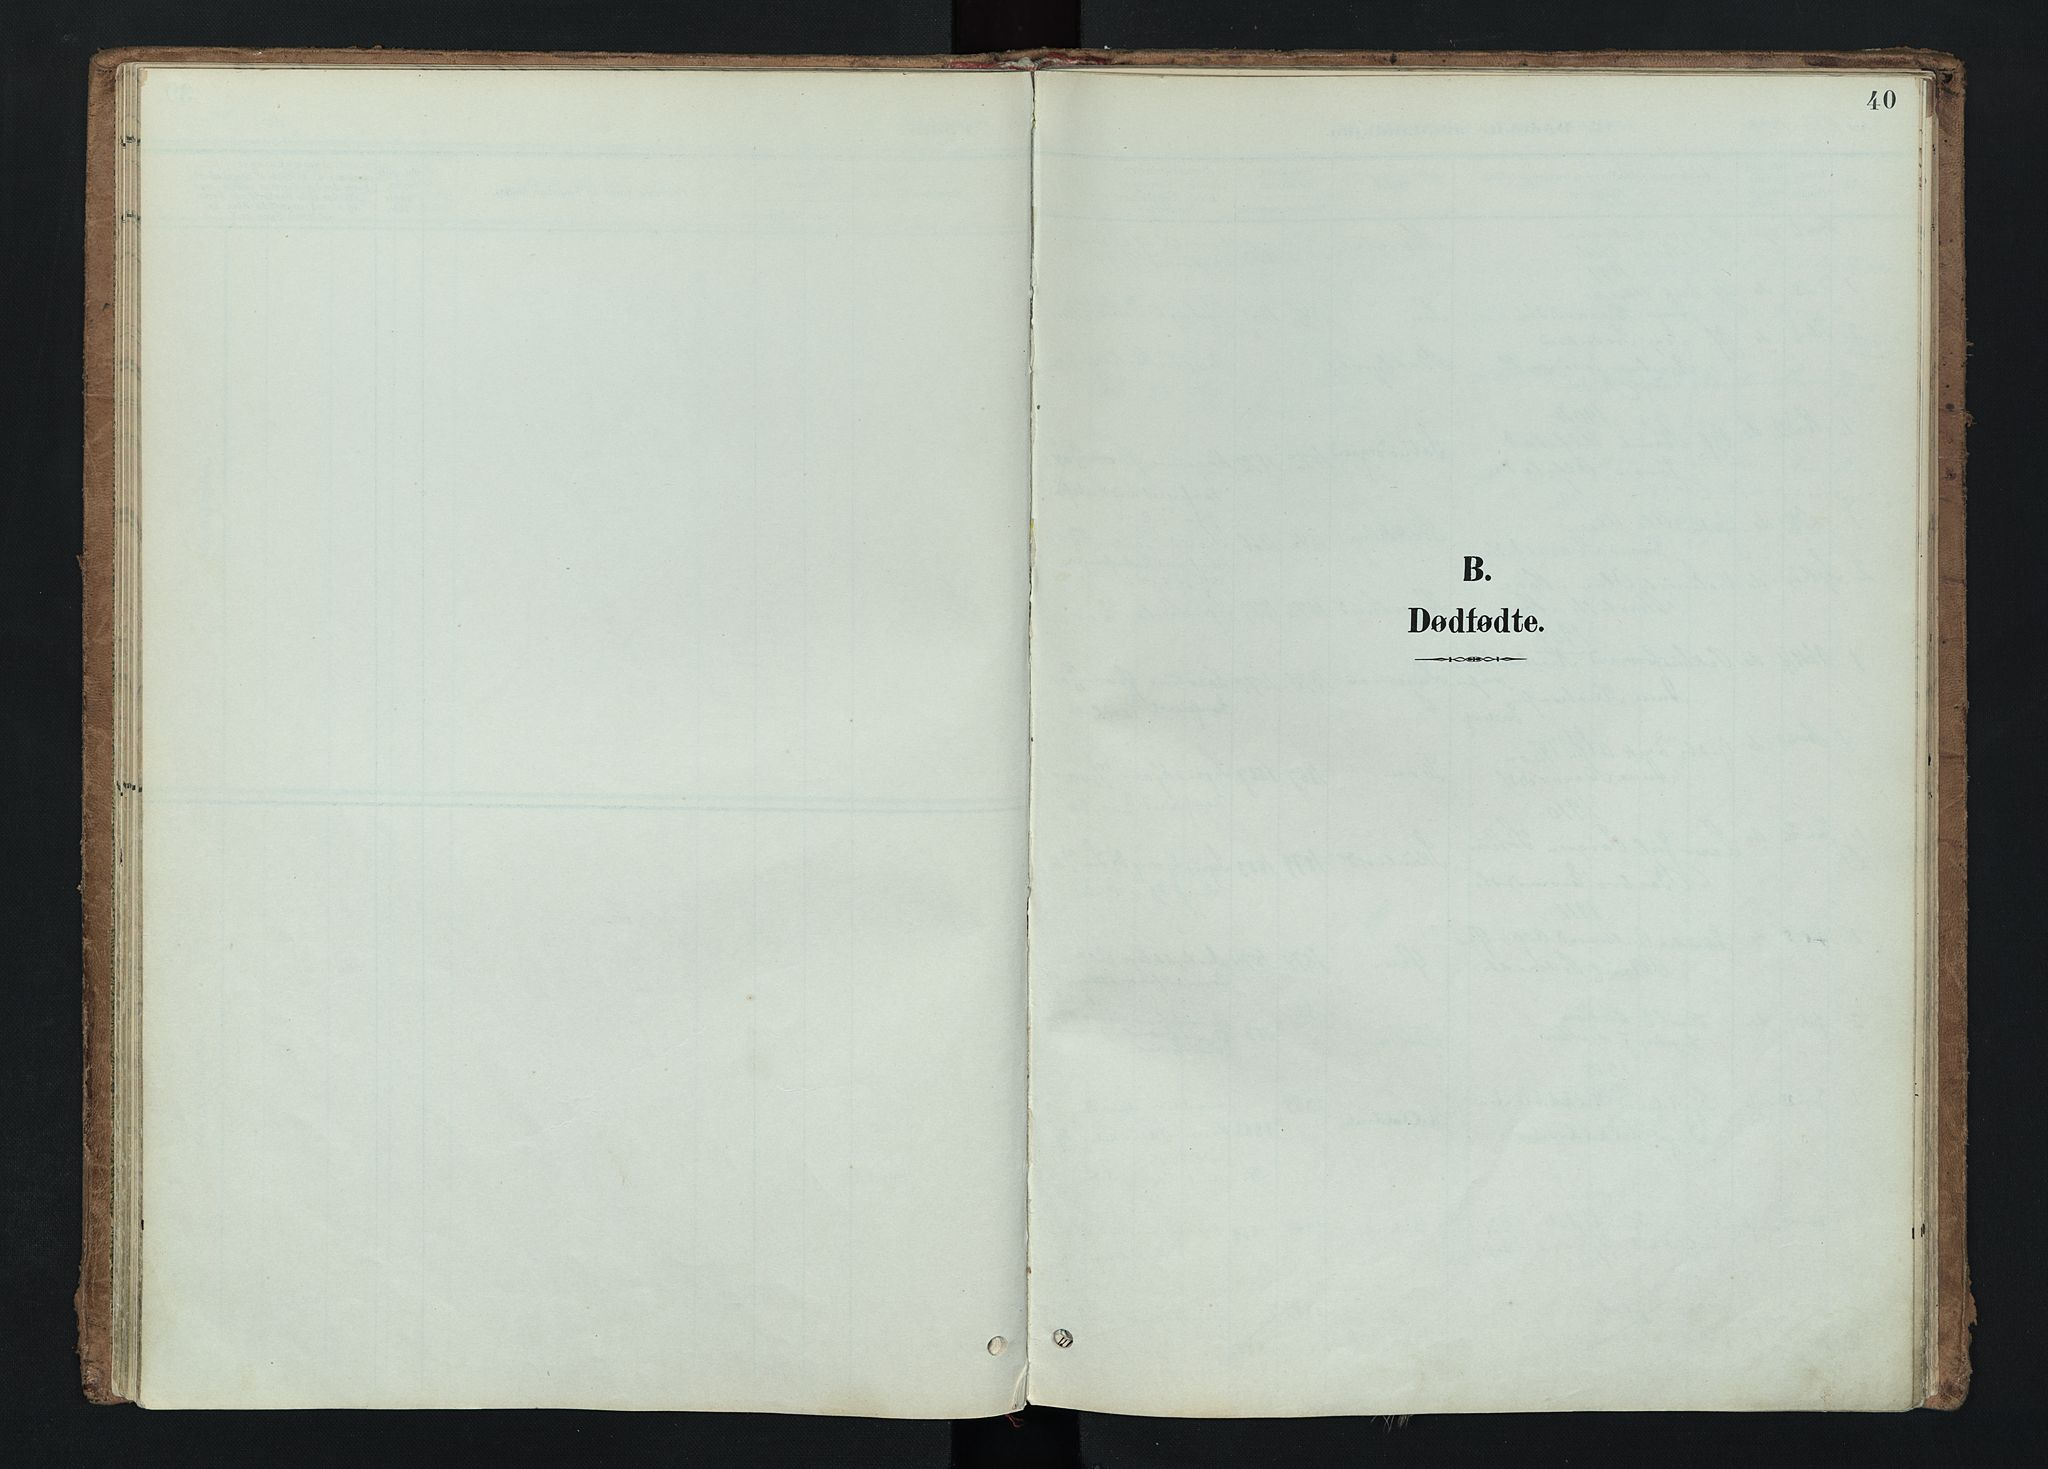 SAH, Nord-Aurdal prestekontor, Ministerialbok nr. 15, 1896-1914, s. 40